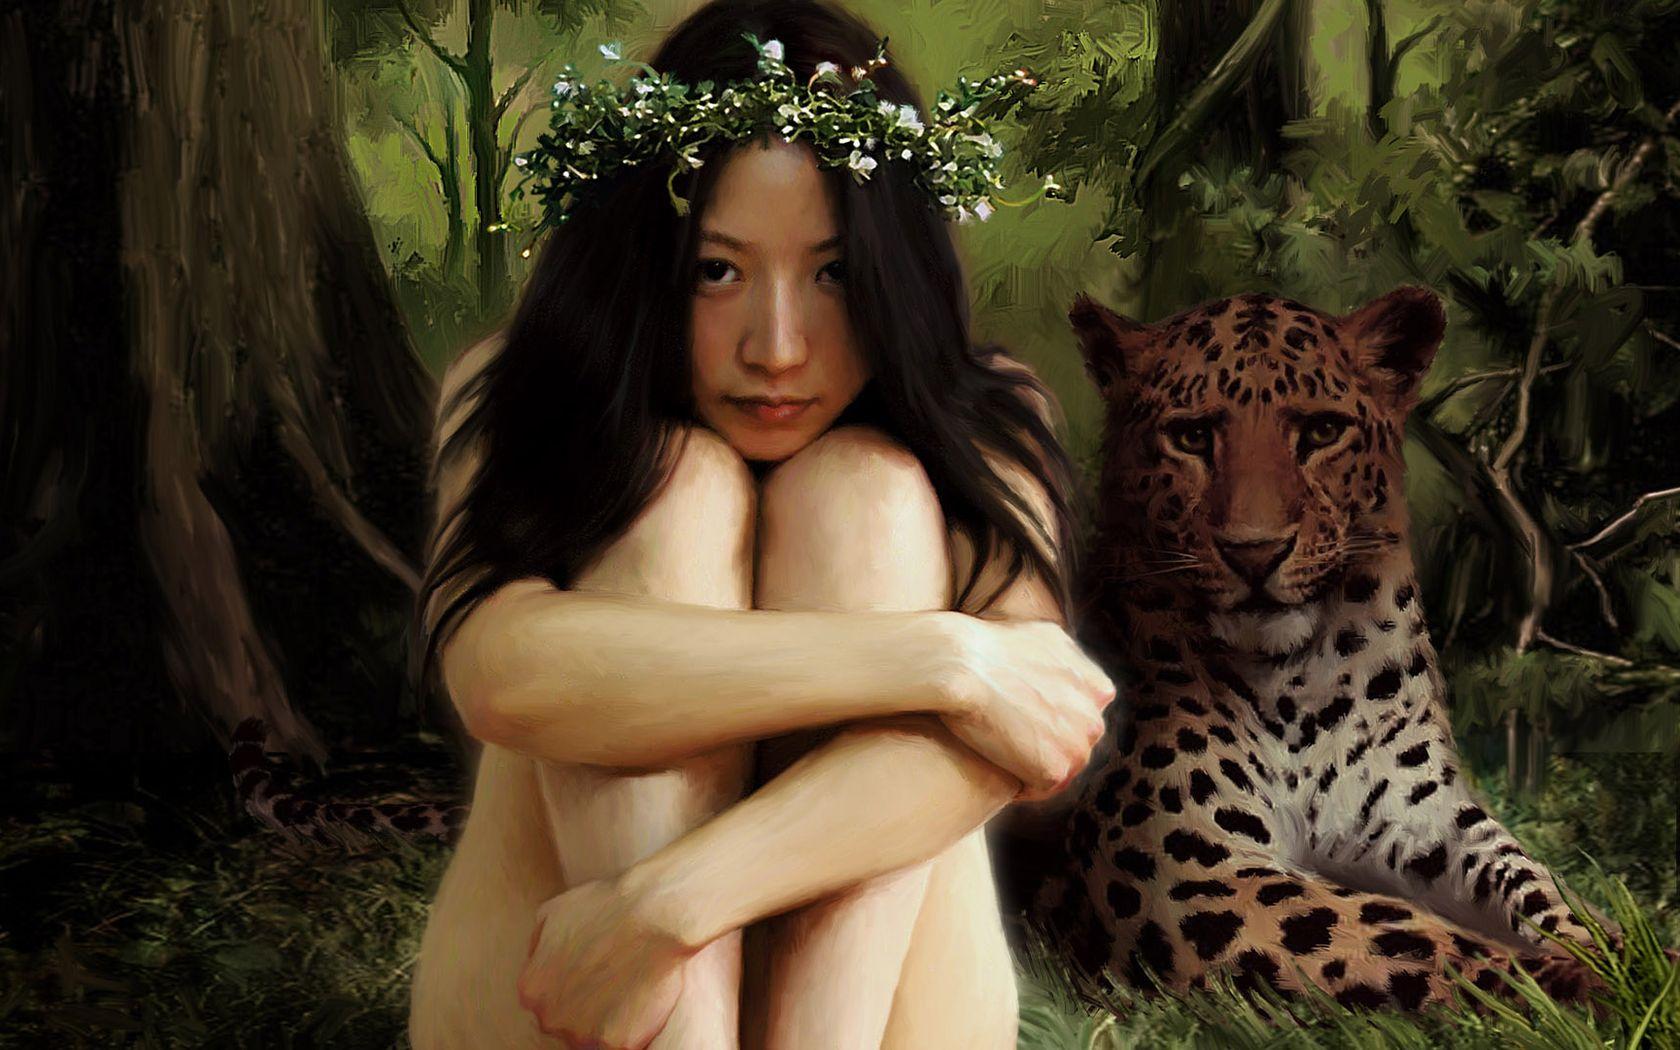 General 1680x1050 Asian leopard forest nature landscape illustration animals painting